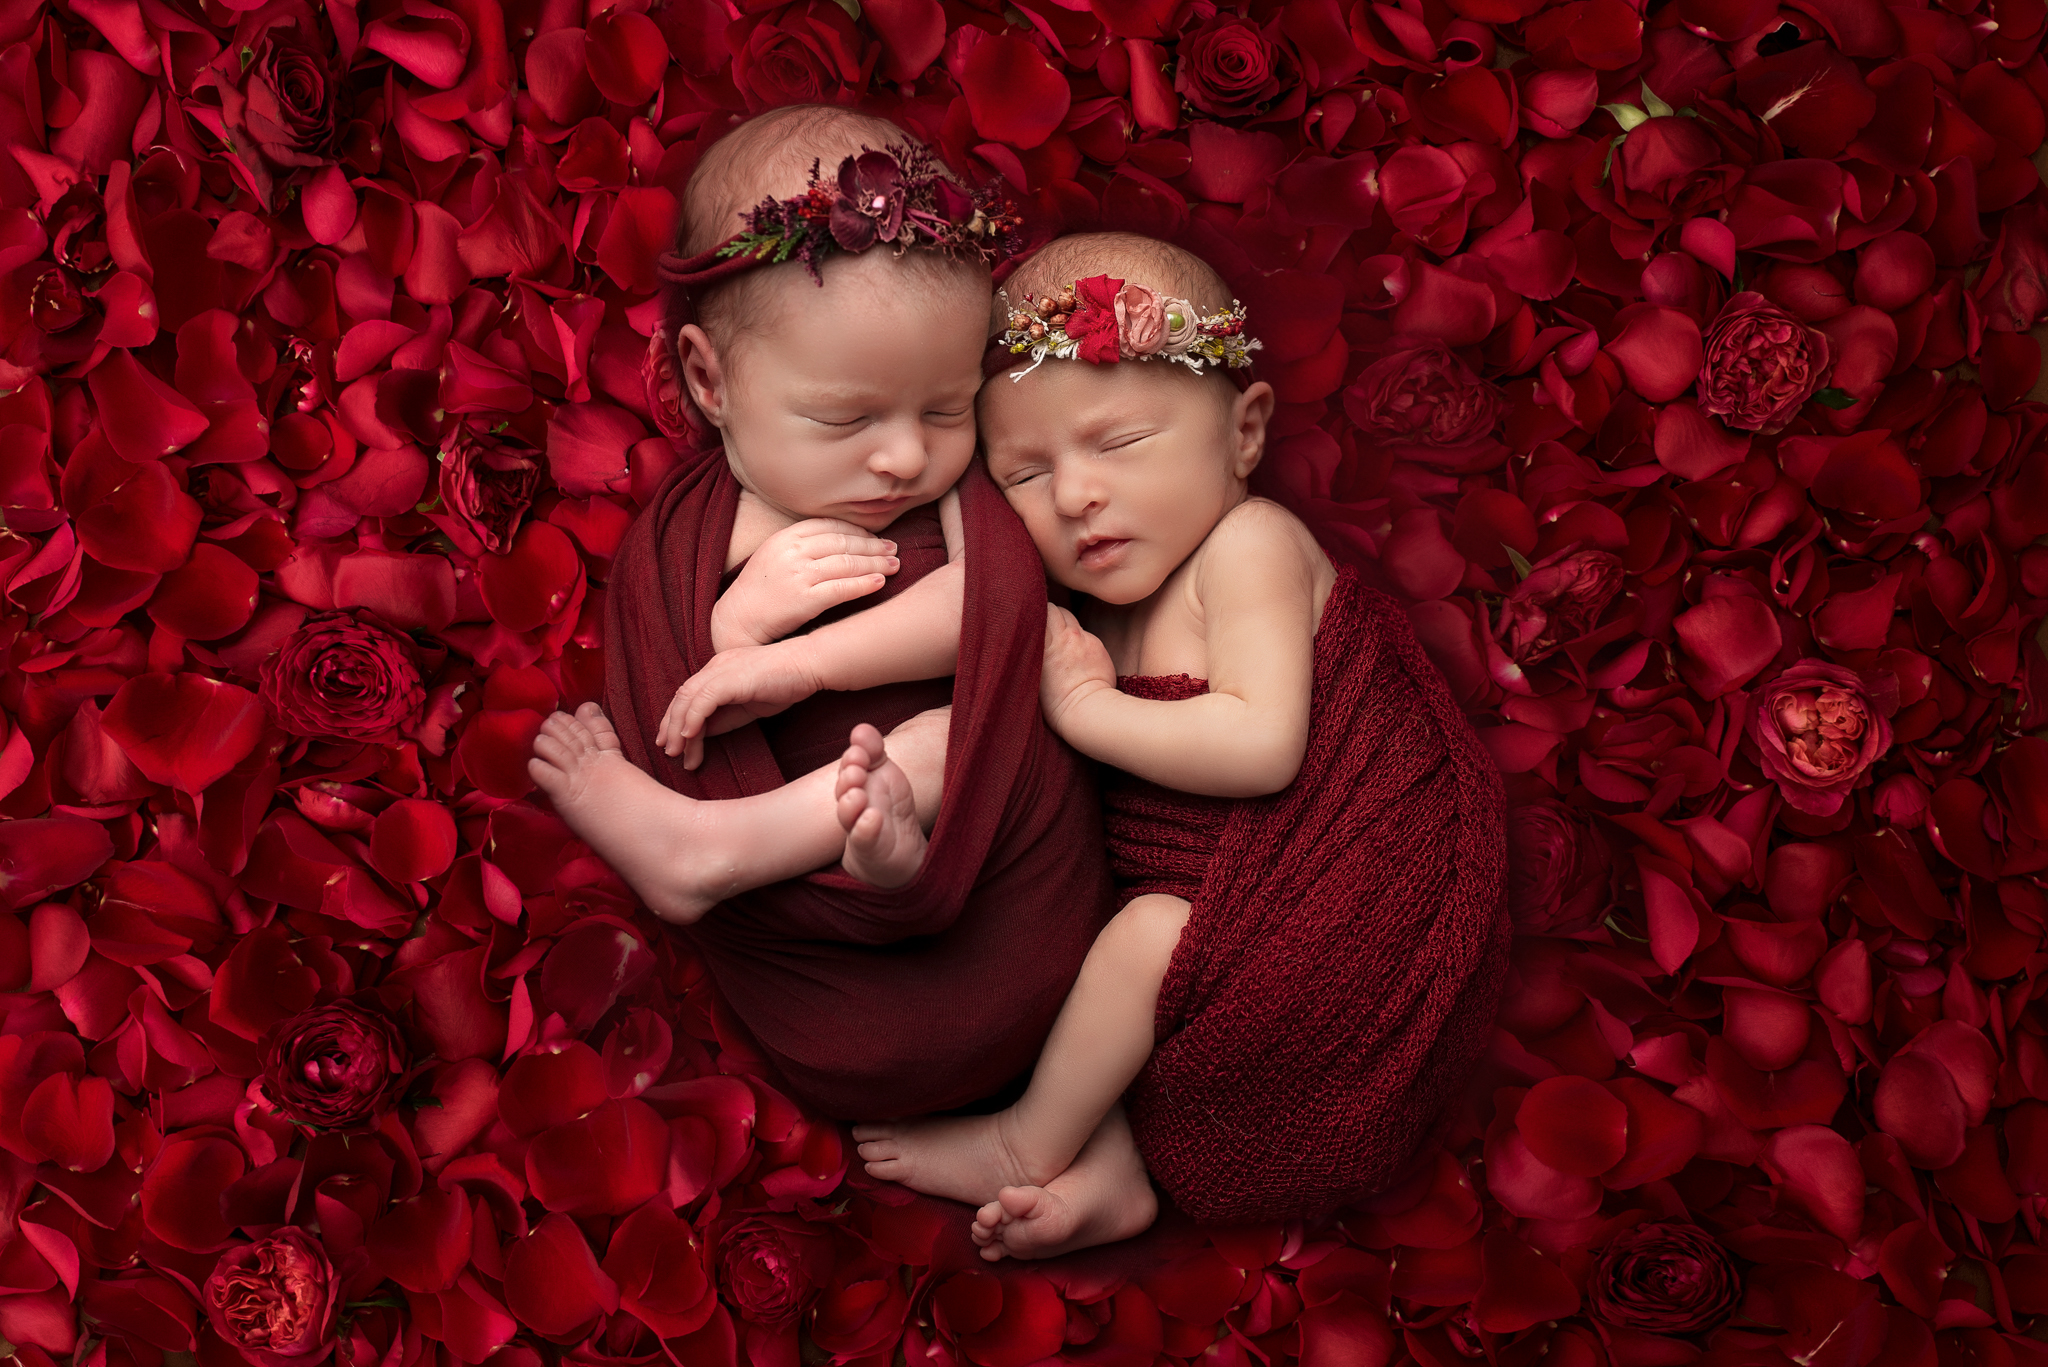 Newborn twin photographer Leeds, newborn photographer Leeds-York-Harrogate-Bradford, Yorkshire: winter theme twin session in Leeds, Yorkshire. Twin baby girls sleeping on a bed of roses